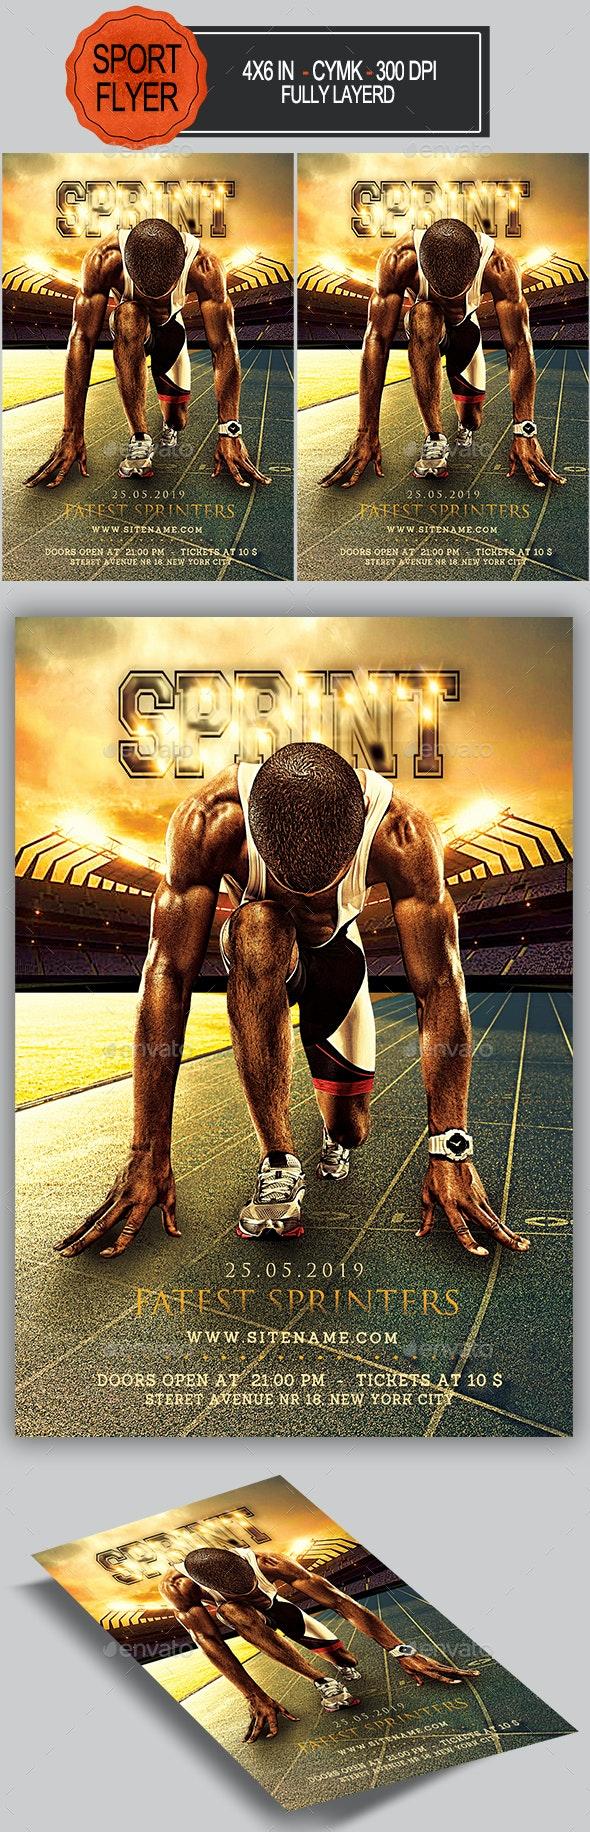 Sprint Run Flyer - Sports Events